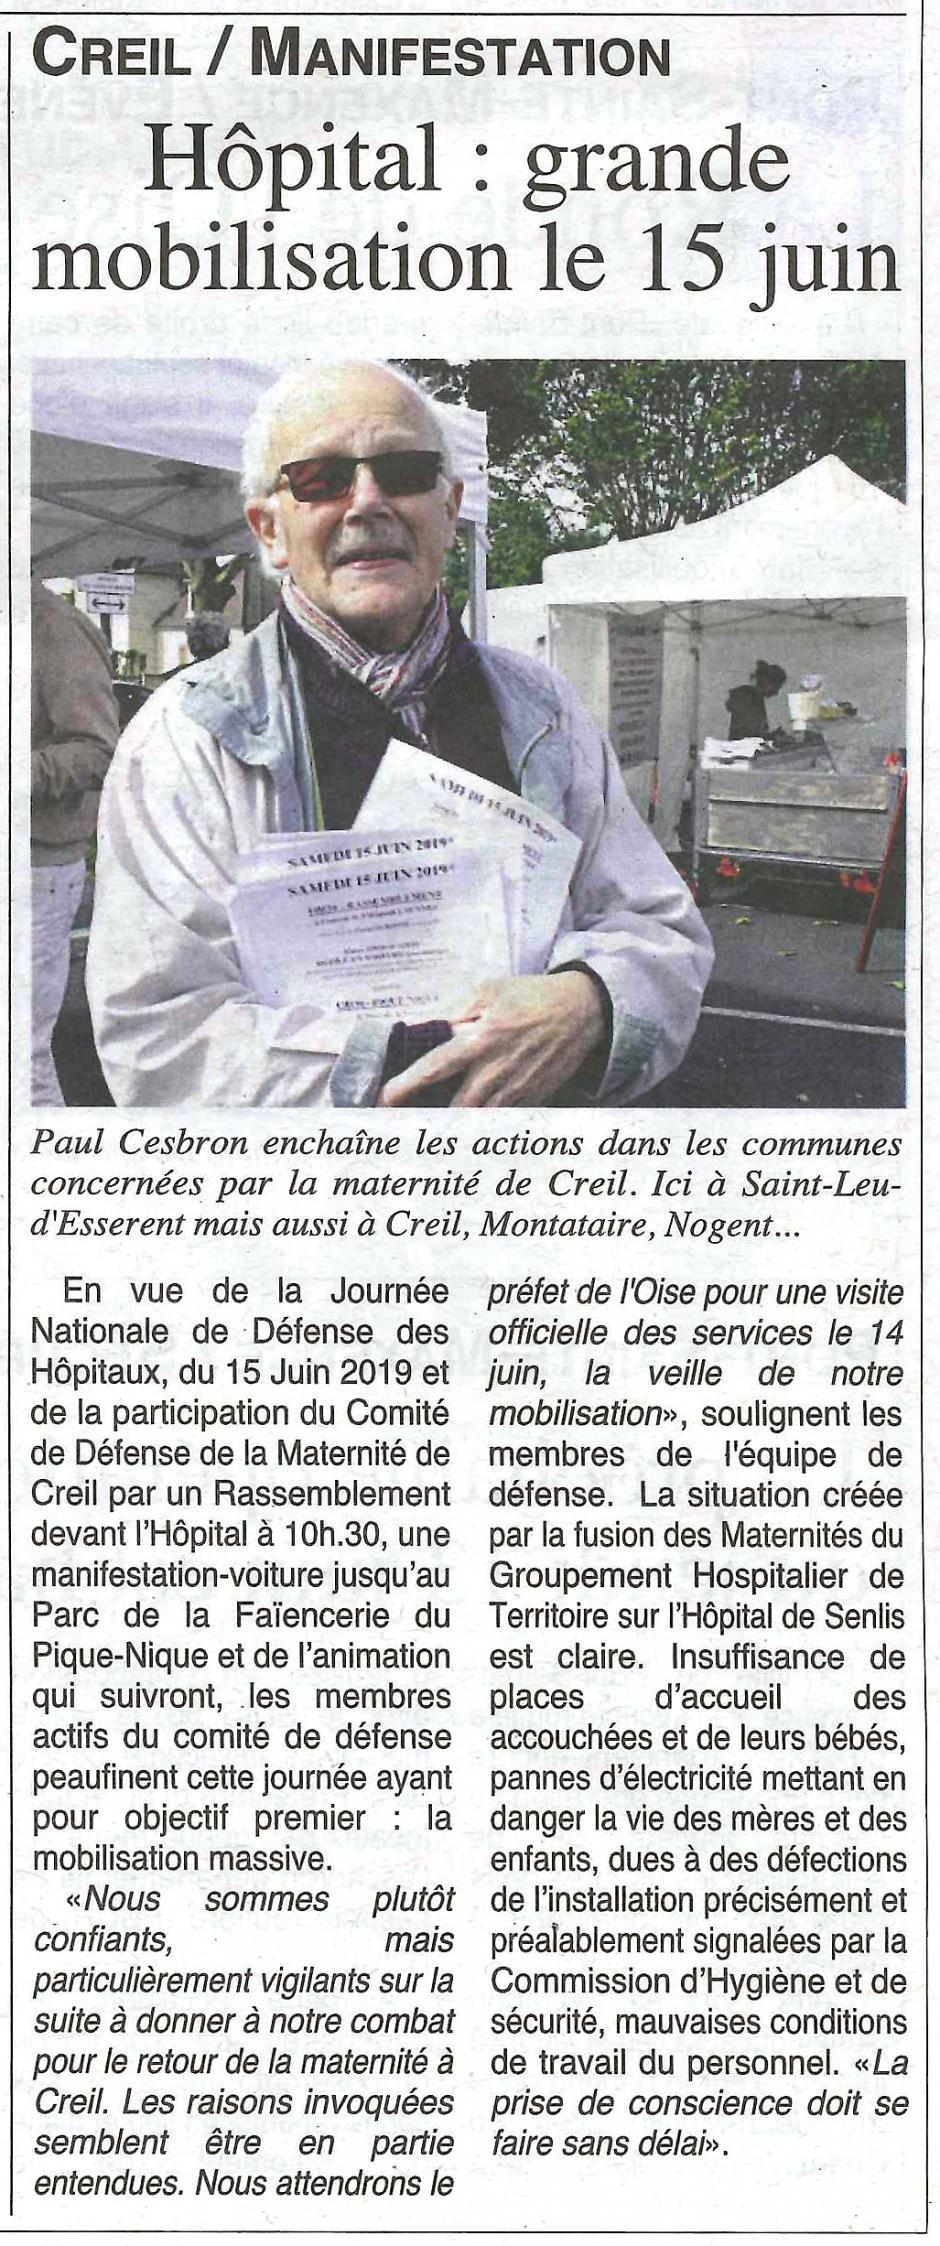 20190612-OH-Creil-Hôpital : grande mobilisation le 15 juin